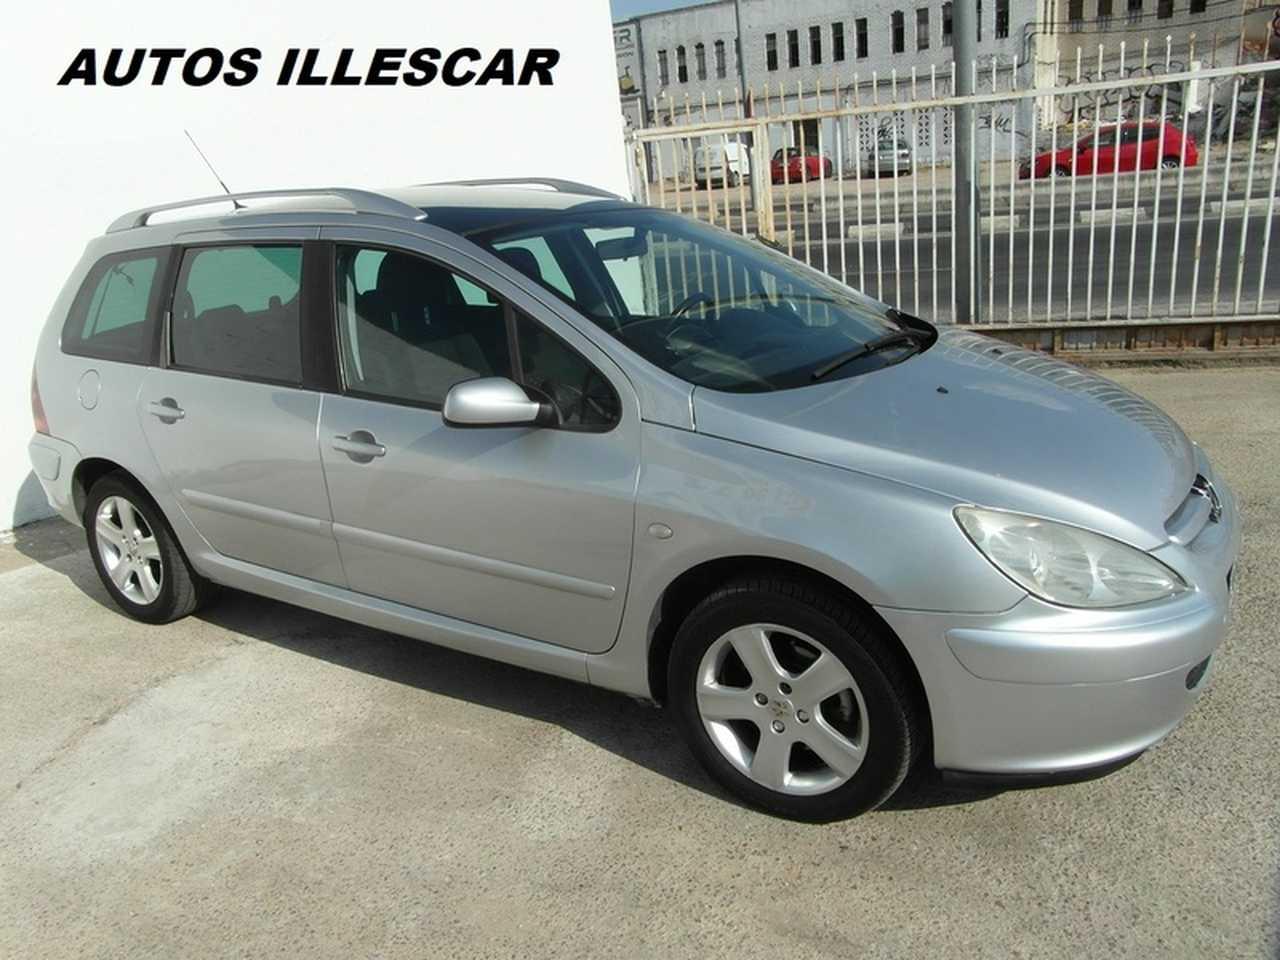 Peugeot 307 SW 1.6 HDI 110 CV  MUY CUIDADO  - Foto 1